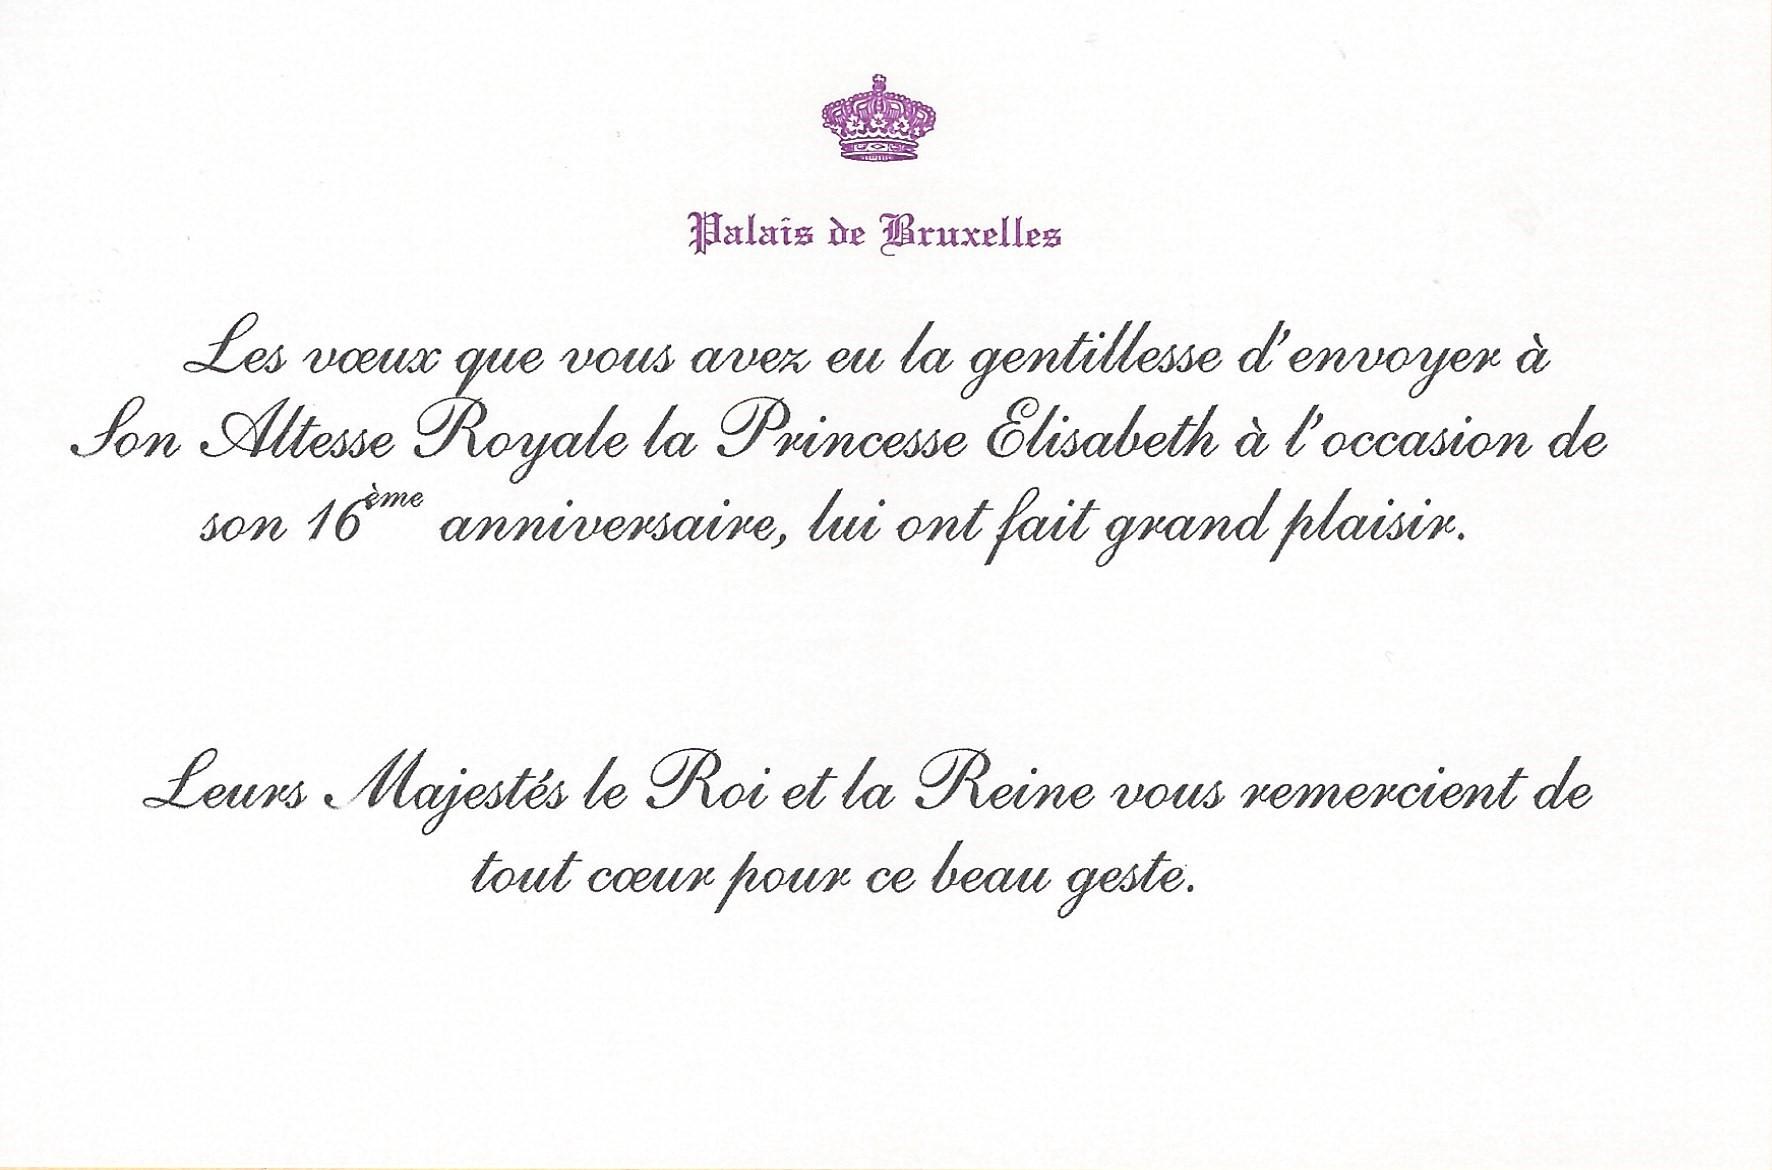 Princess Elisabeth, The Duchess of Brabant's 16th Birthday card